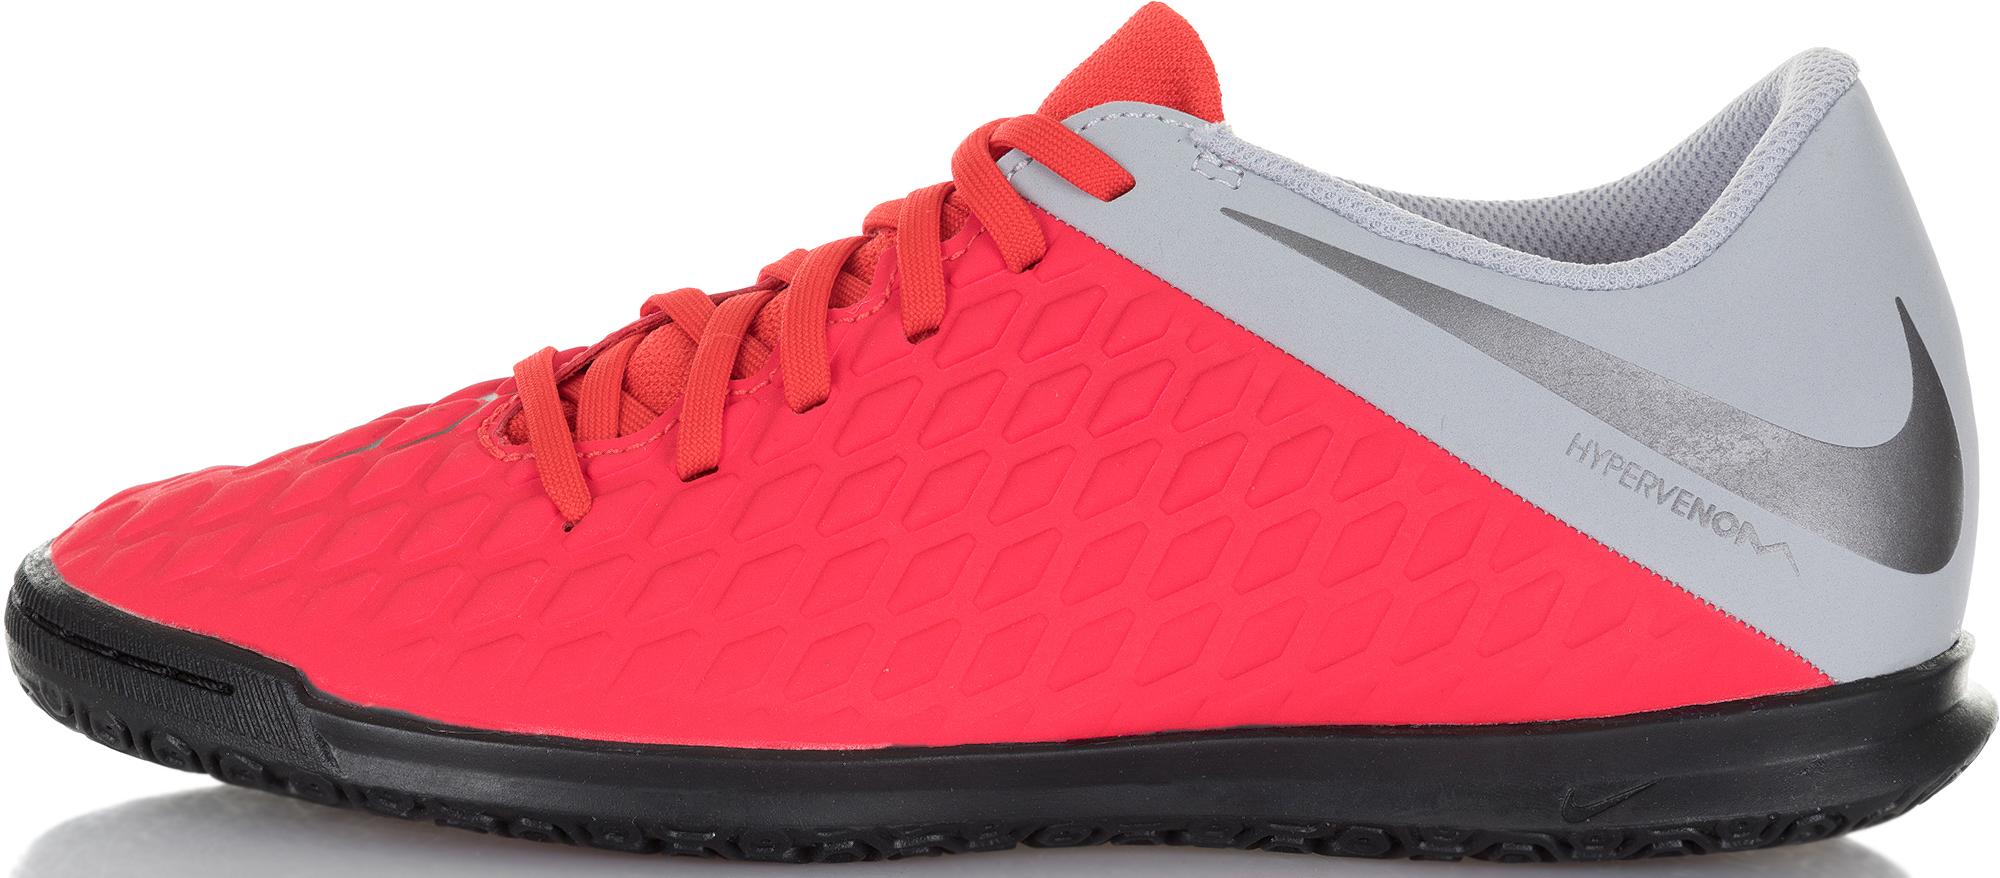 Nike Бутсы мужские Nike Hypervenom 3 Club IC, размер 41 nike бутсы мужские nike neymar vaporx 12 club ic размер 41 5